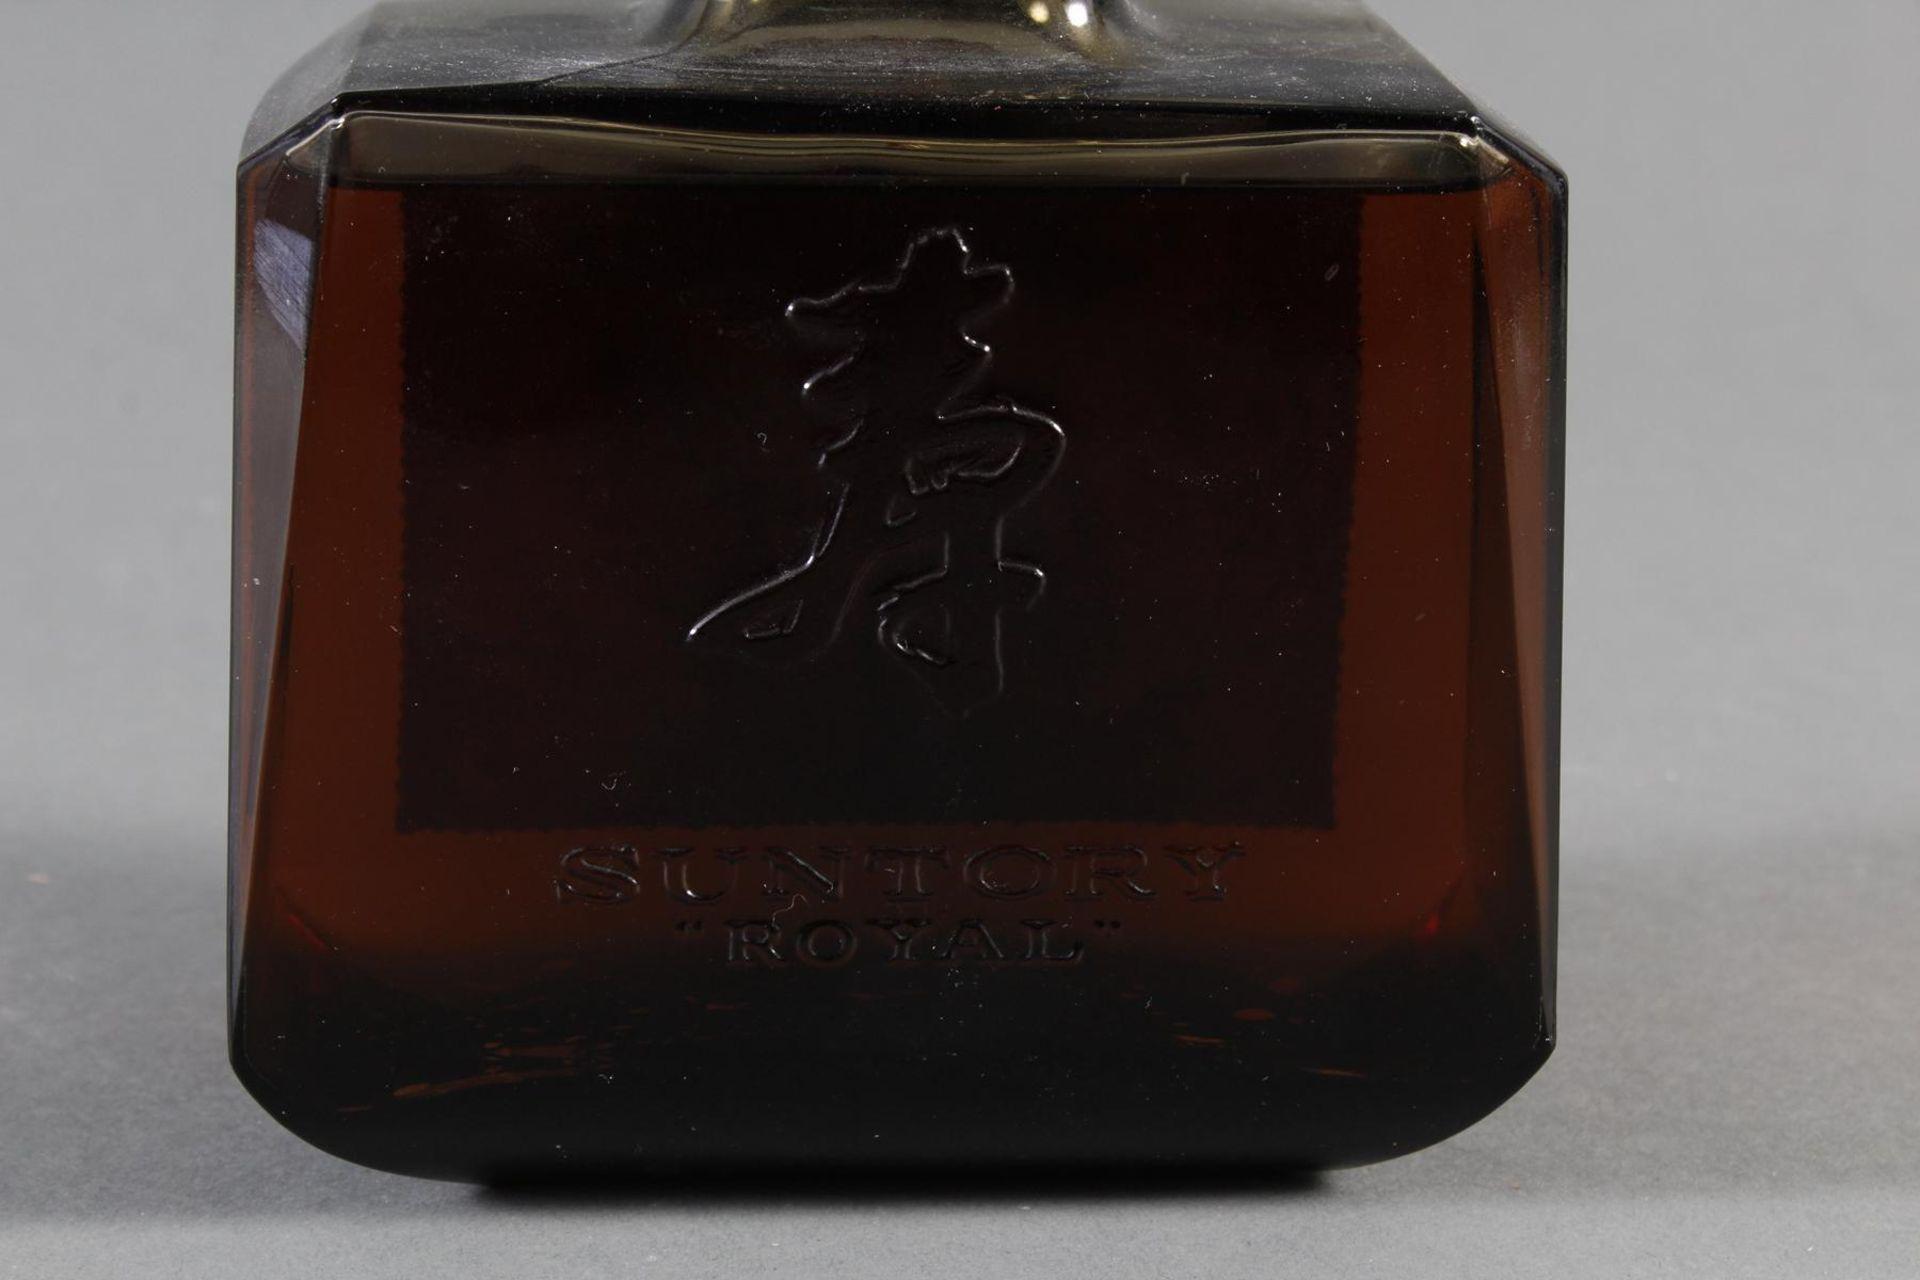 Rare Old Whisky Suntory Royal ´60 Special Reserve Yamazaki - Bild 3 aus 3